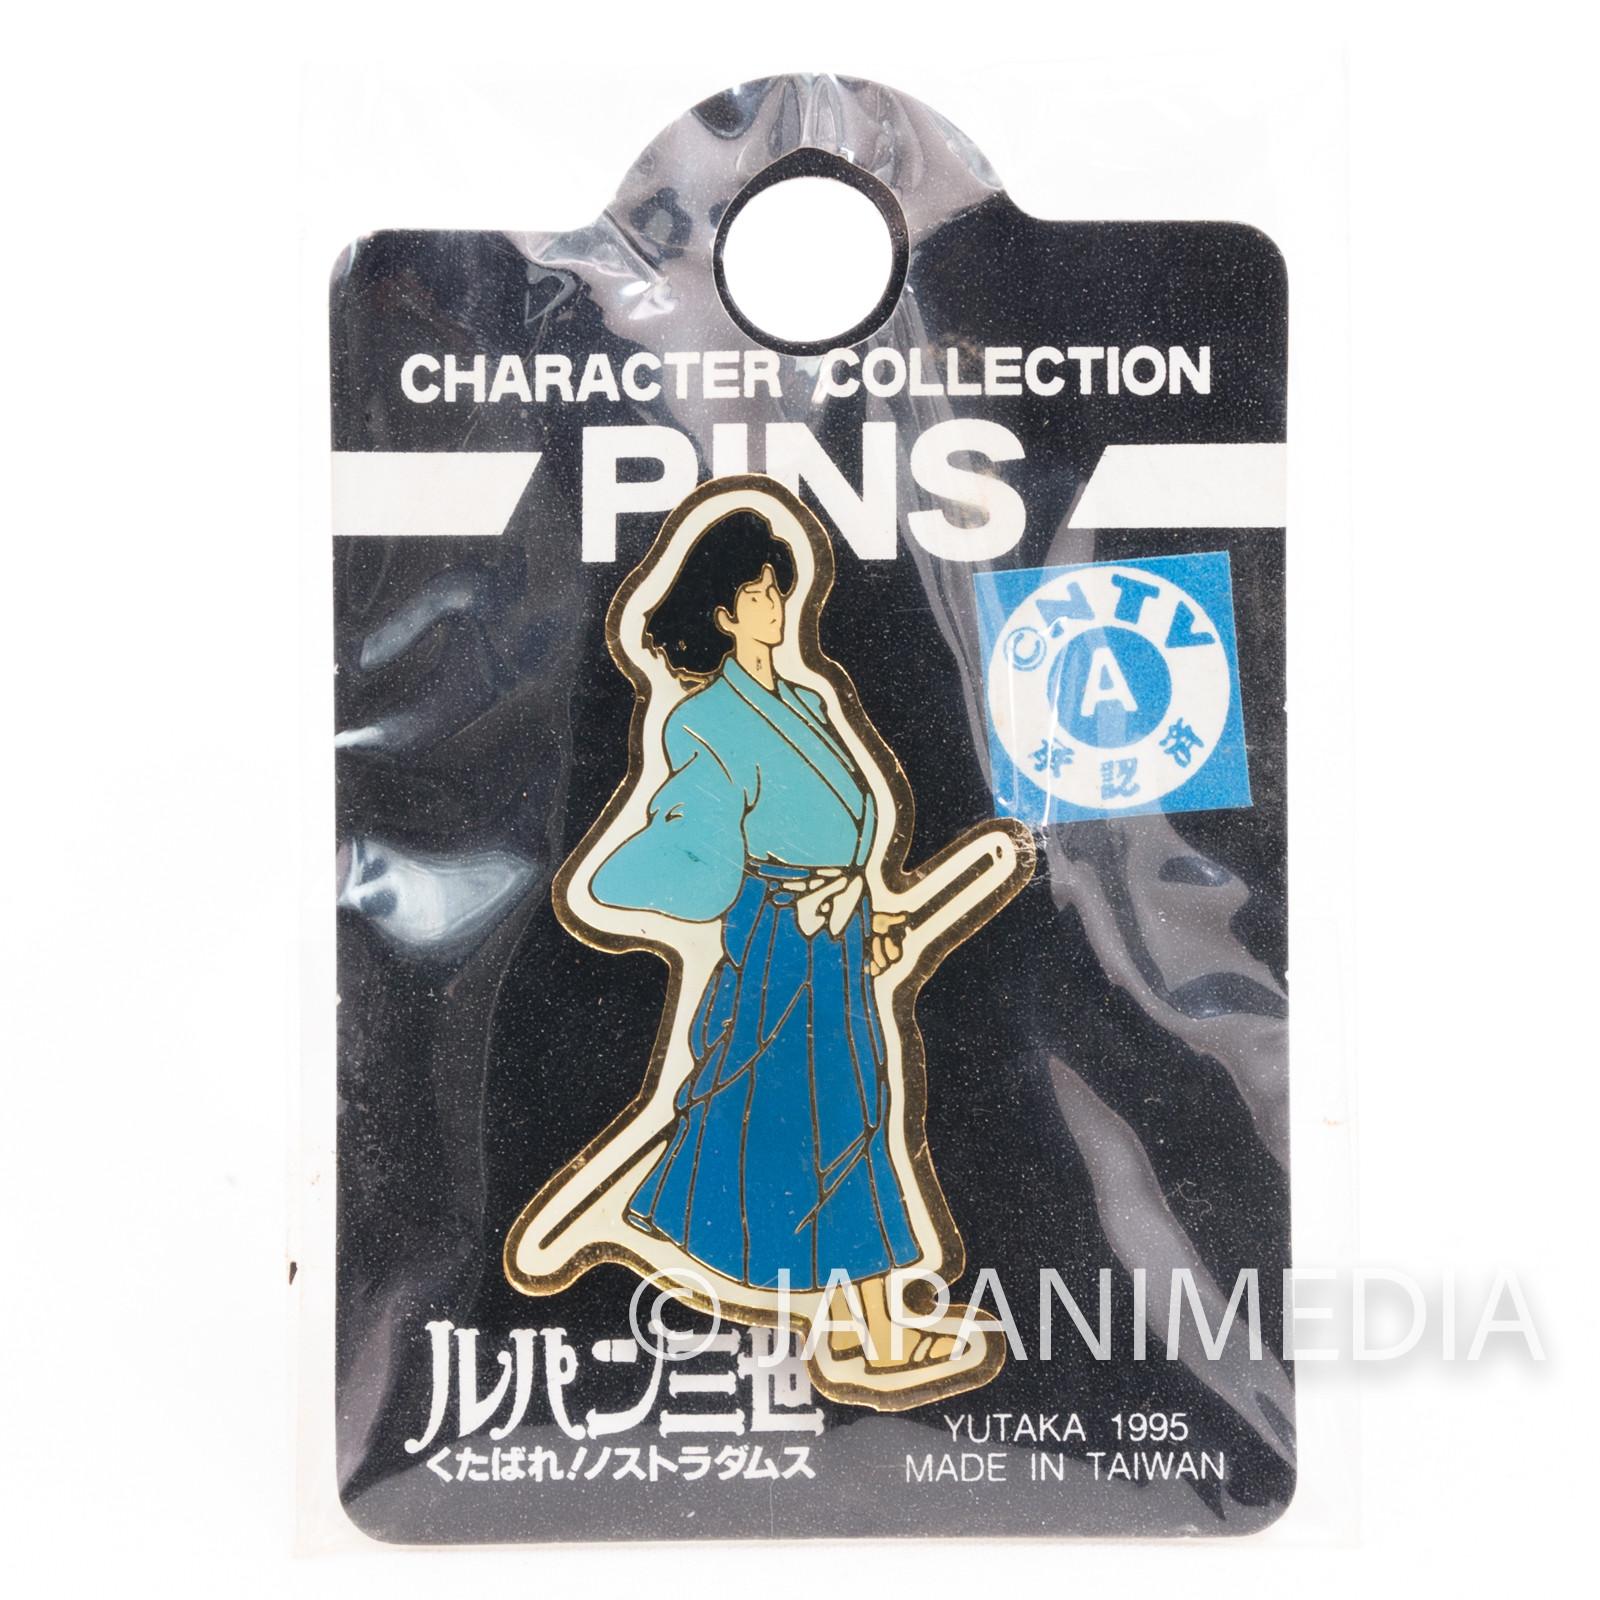 Lupin the Third (3rd) Goemon Ishikawa Metal Pins JAPAN ANIME